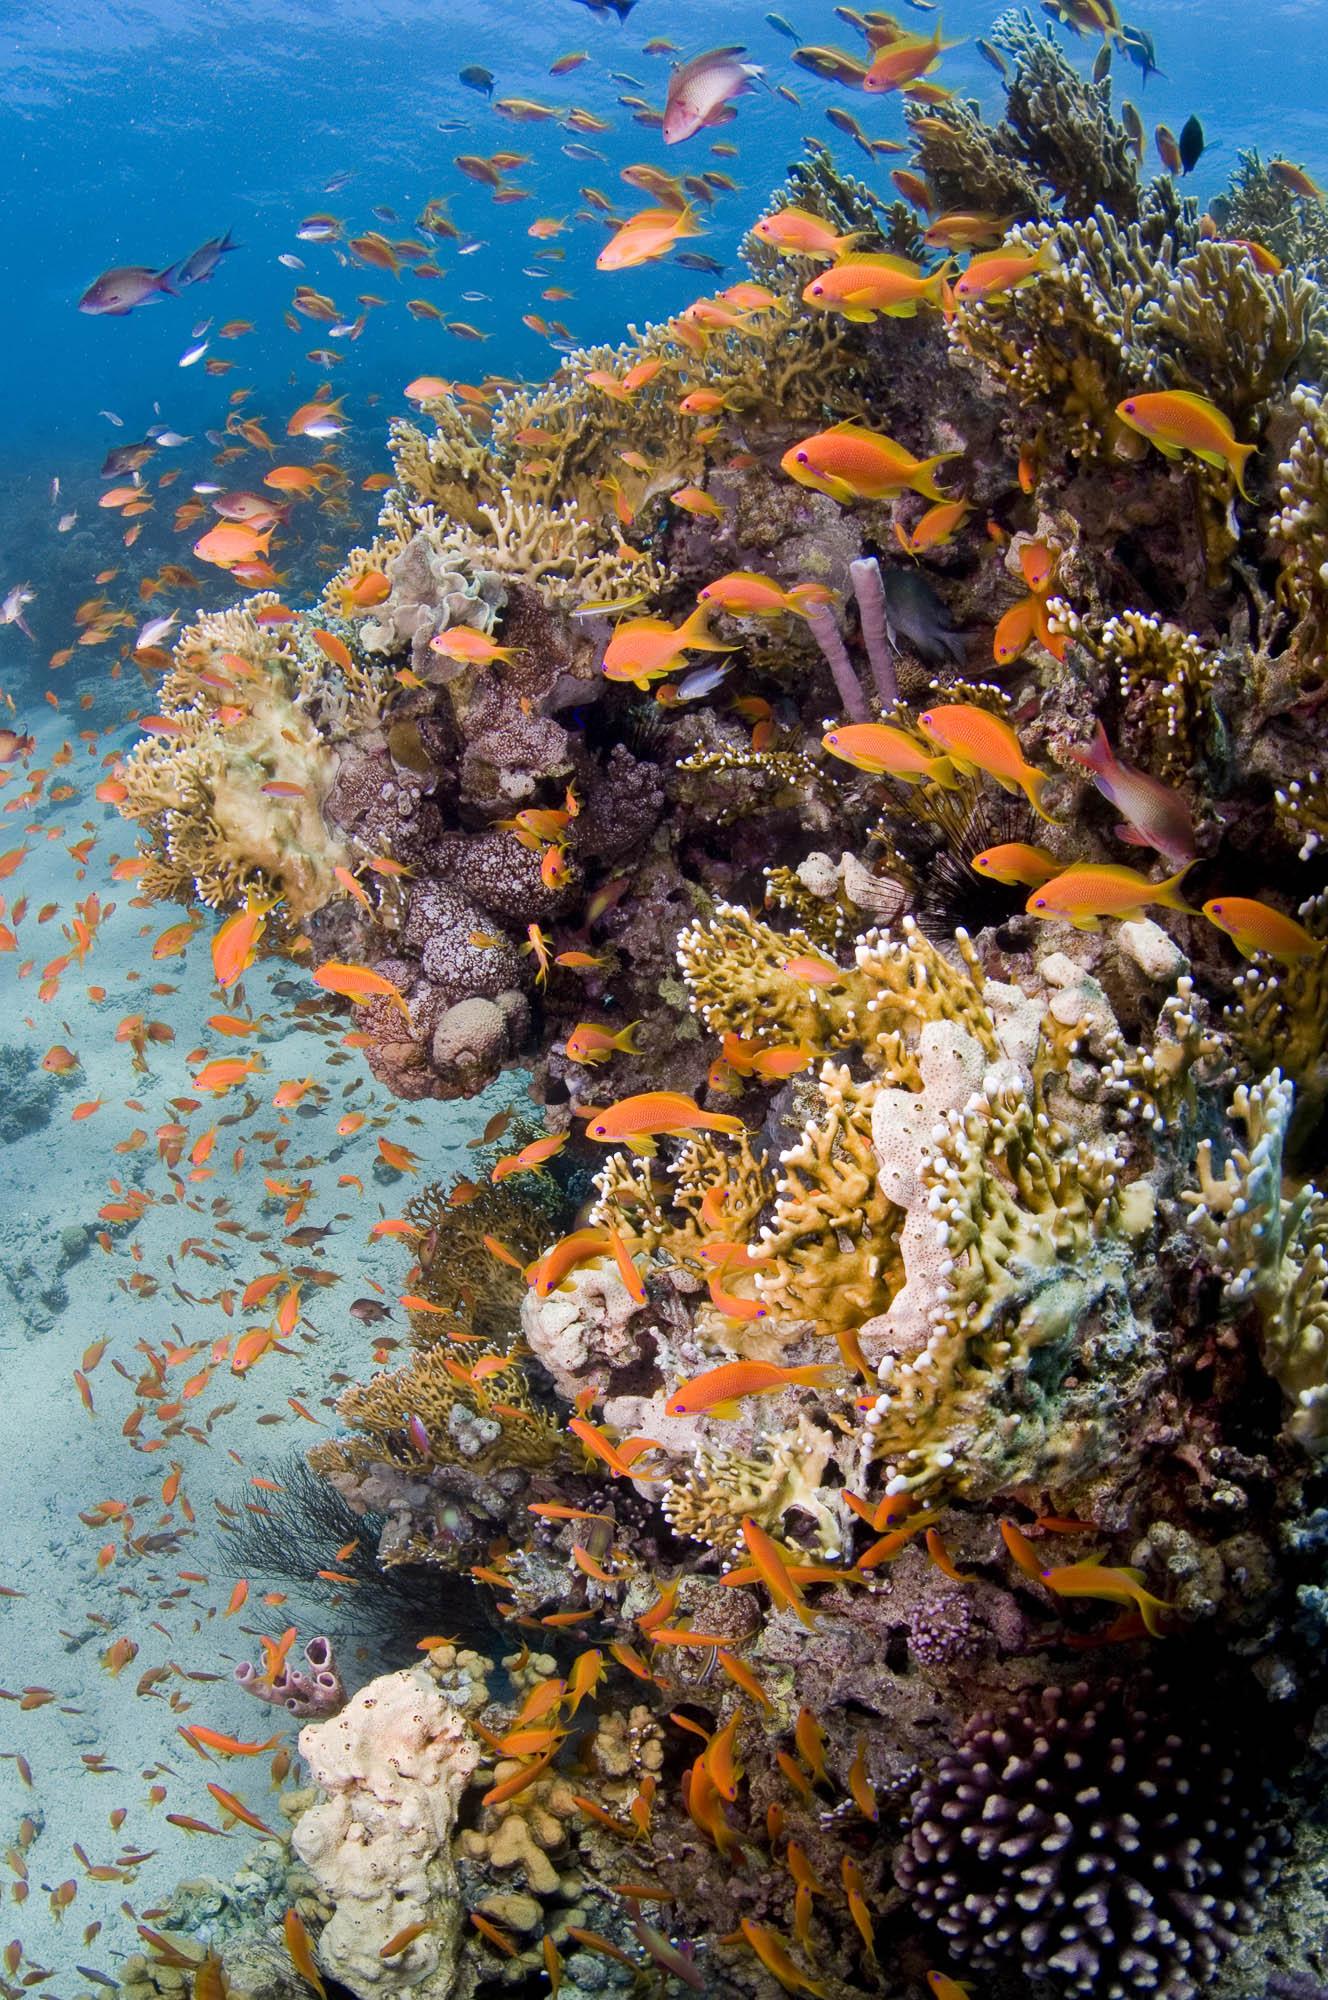 03 - fish swim On a healthy reef credit: warren baverstock / coral reef image bank